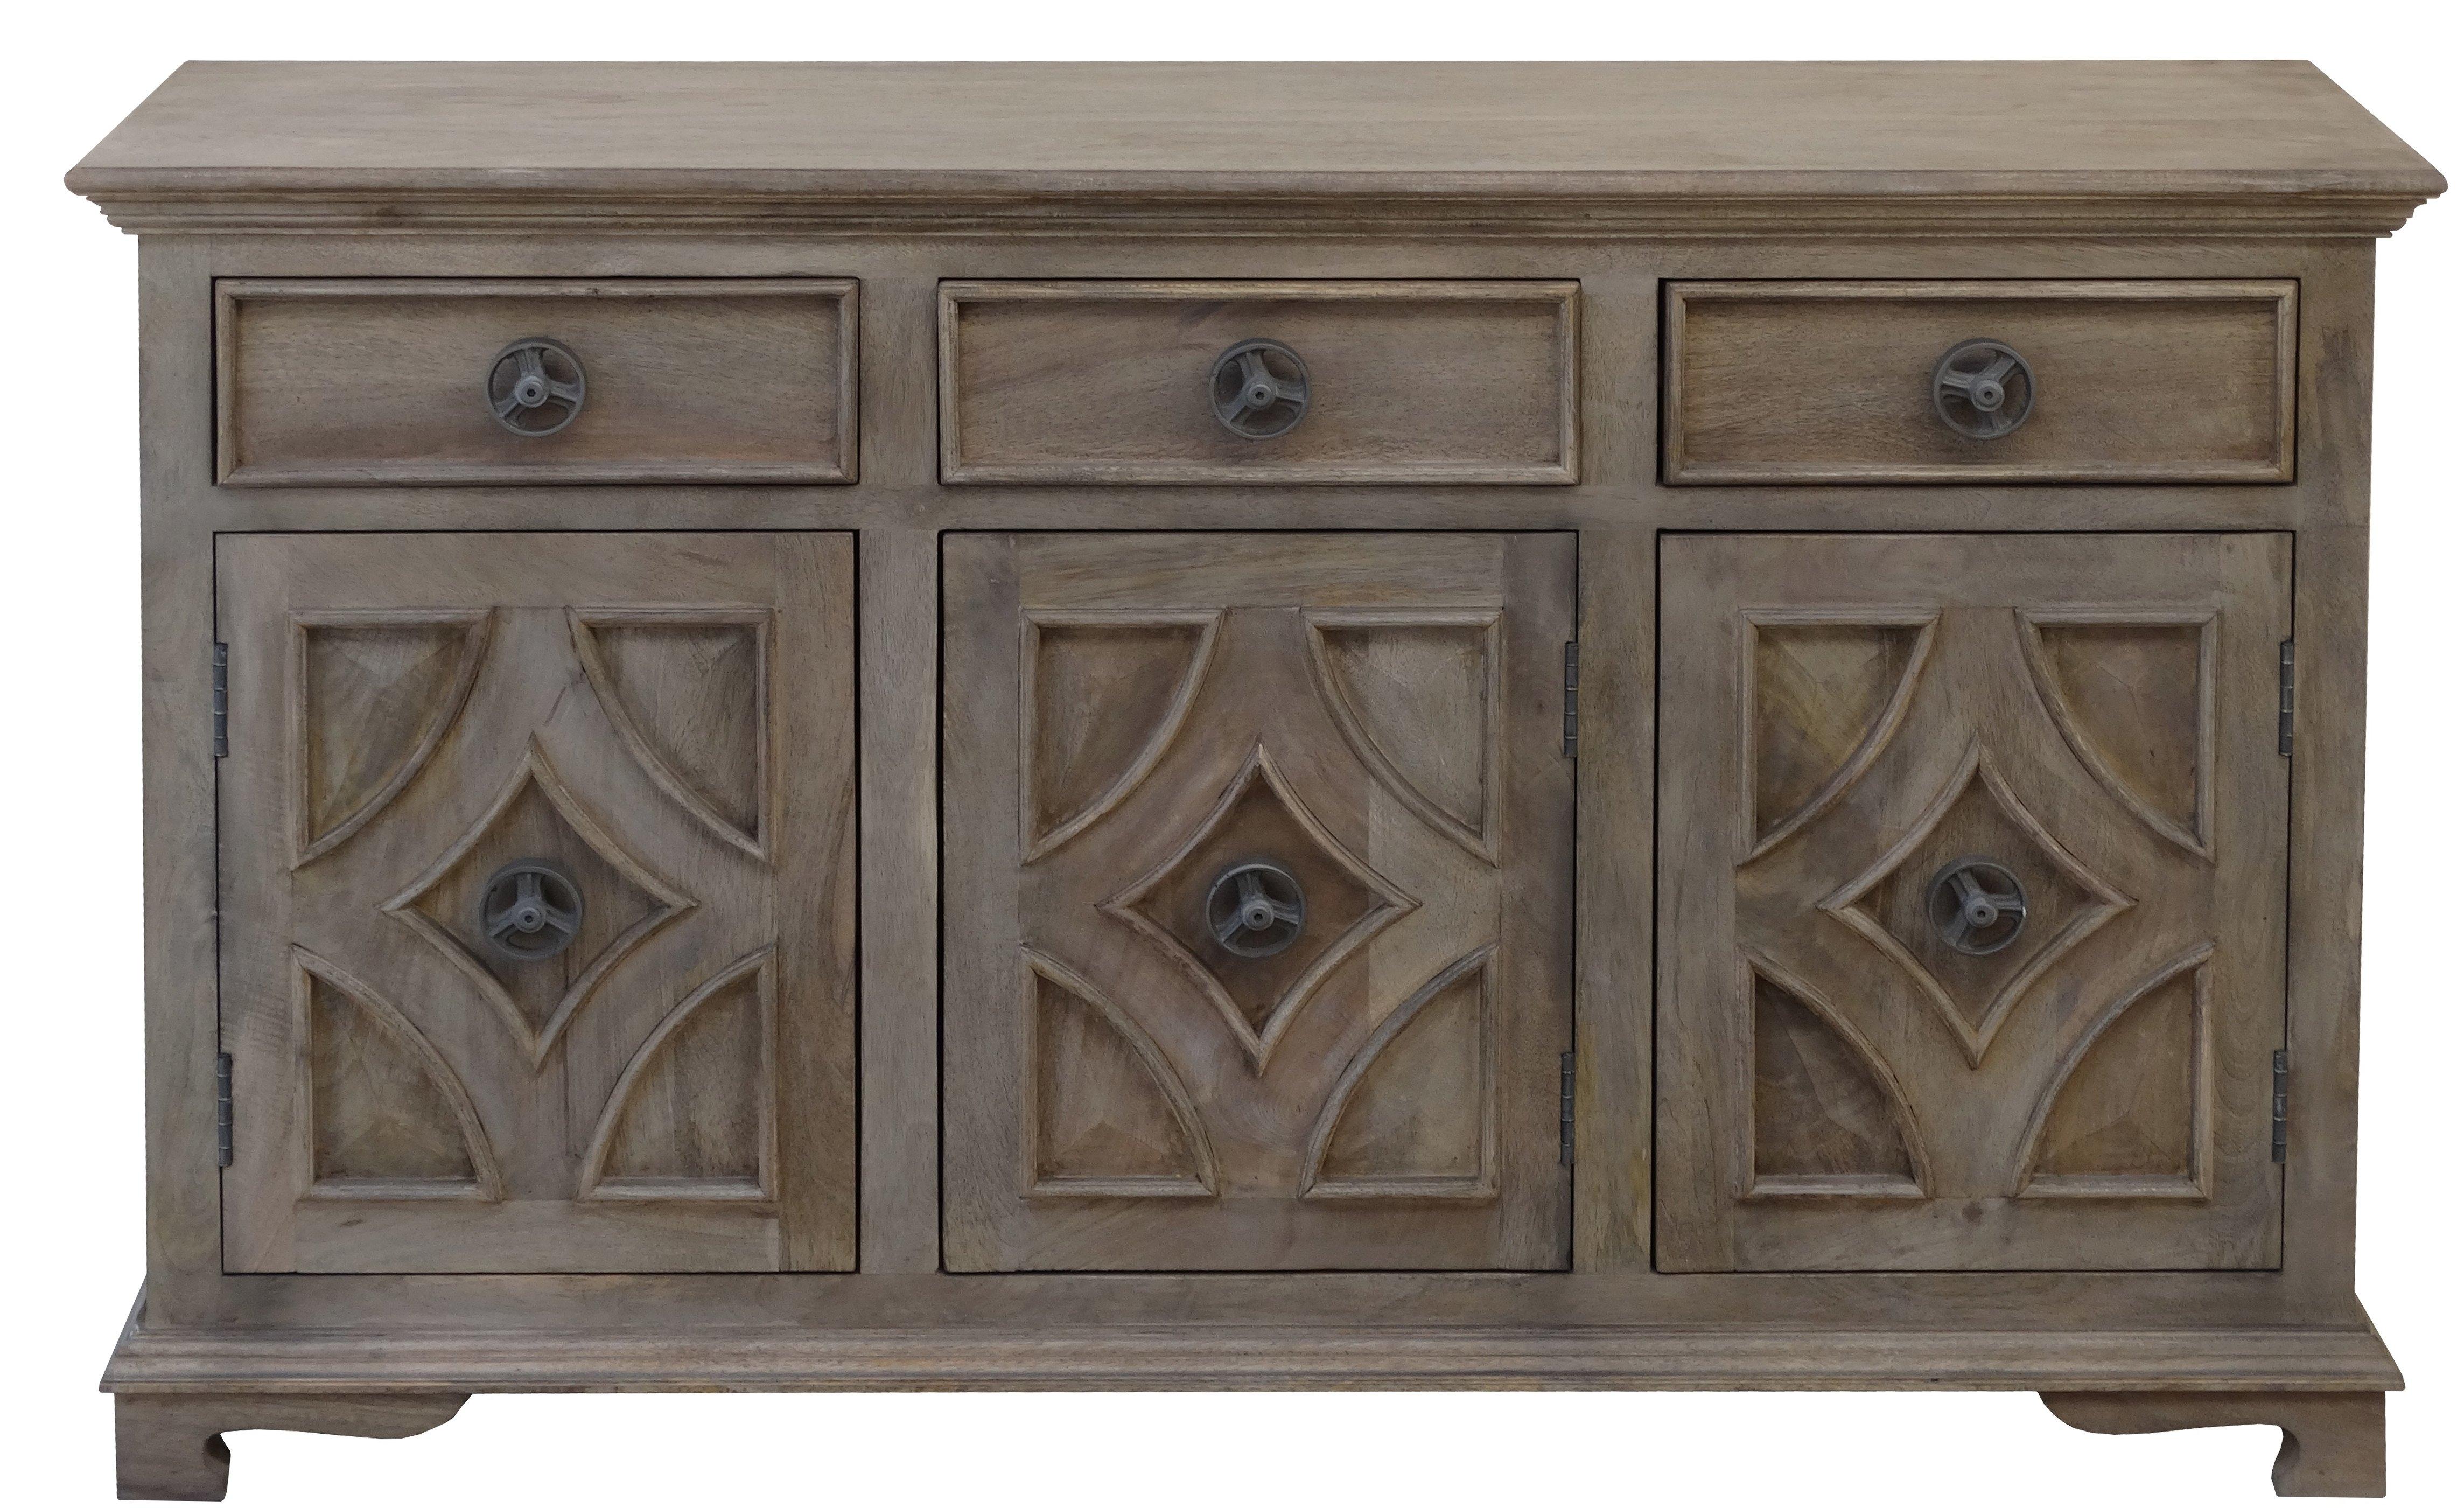 Hayter Sideboard & Reviews | Joss & Main within Reclaimed Pine & Iron 4-Door Sideboards (Image 13 of 30)